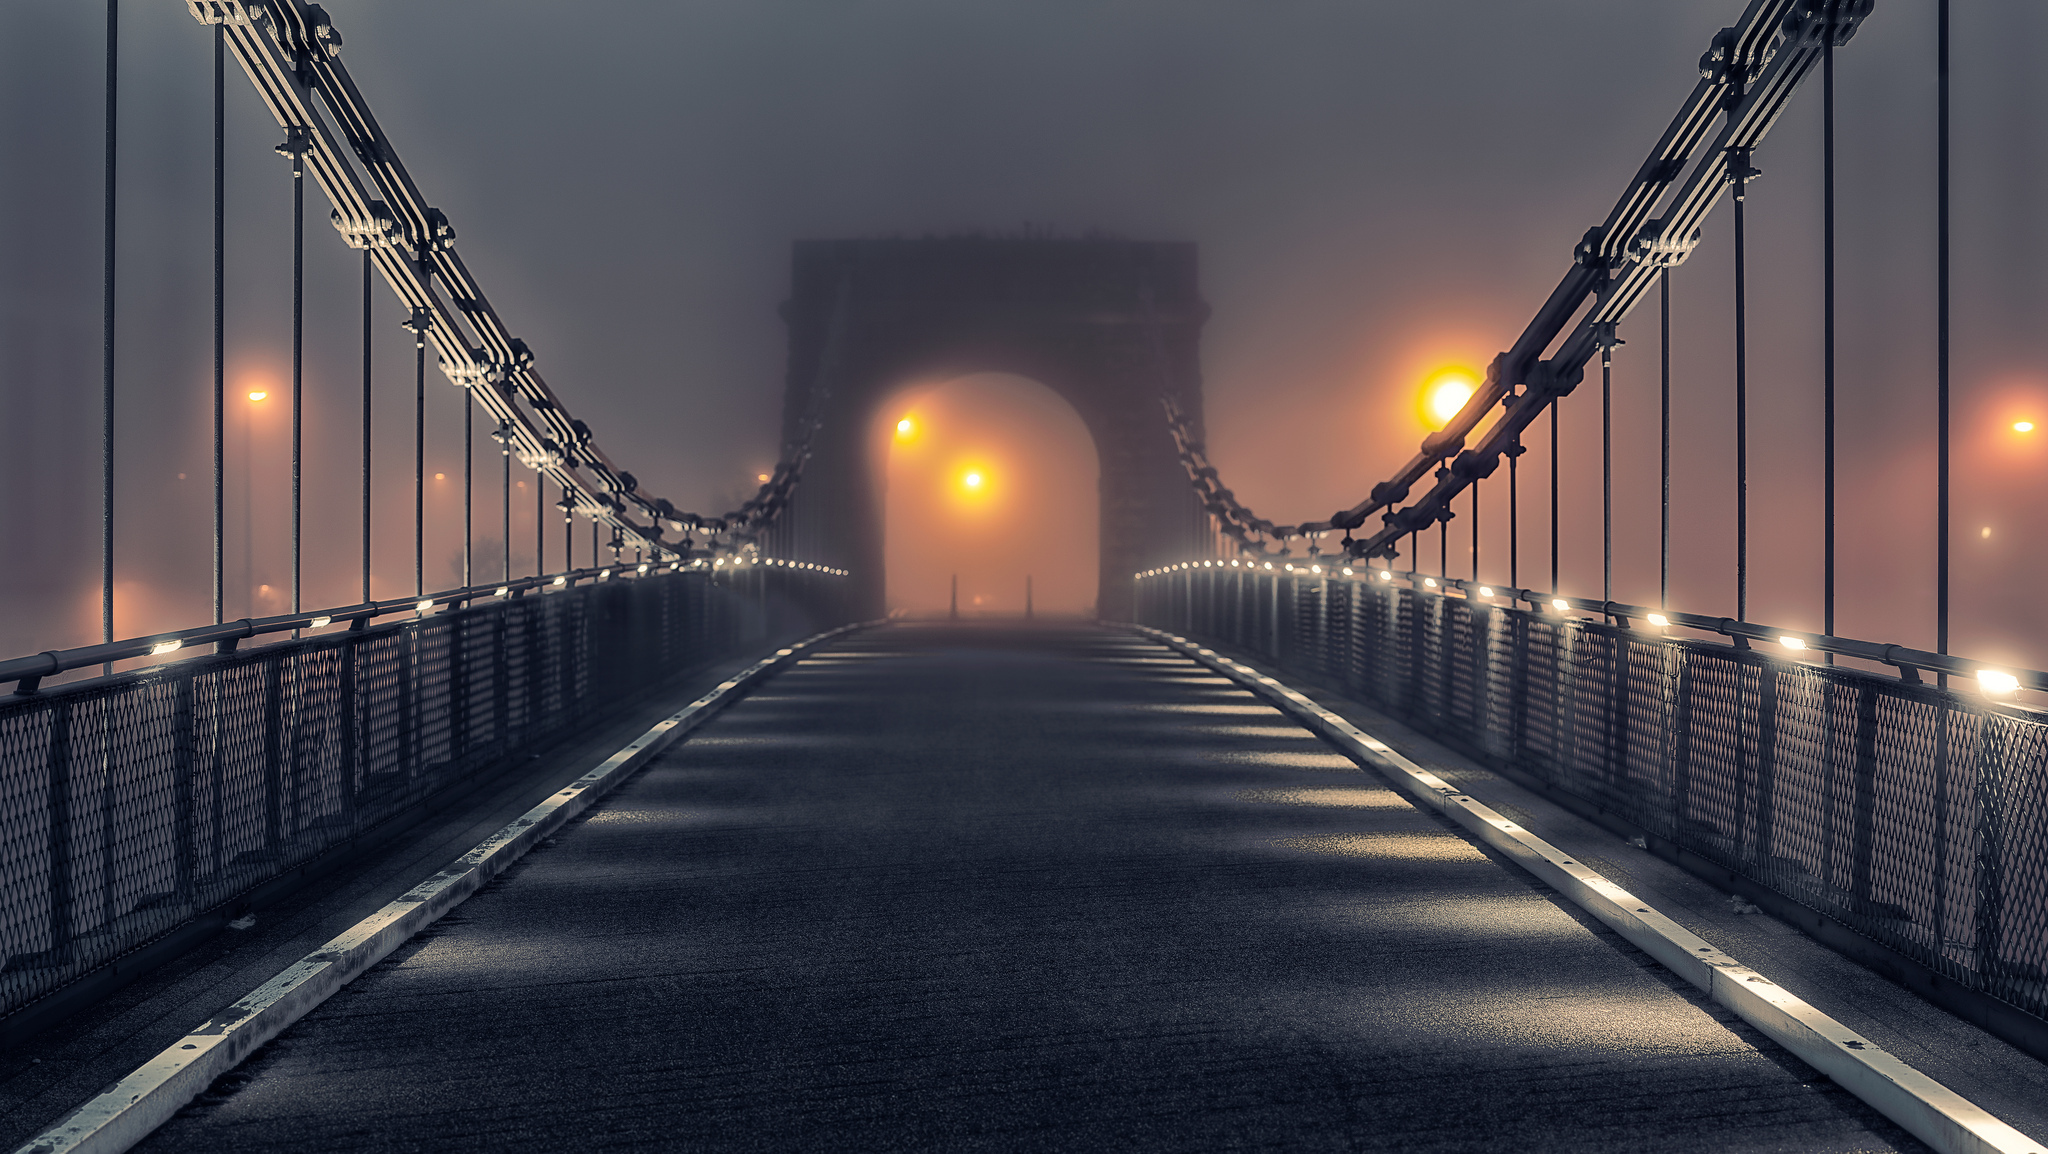 прошу картинки на мосту человека недвижимого имущества